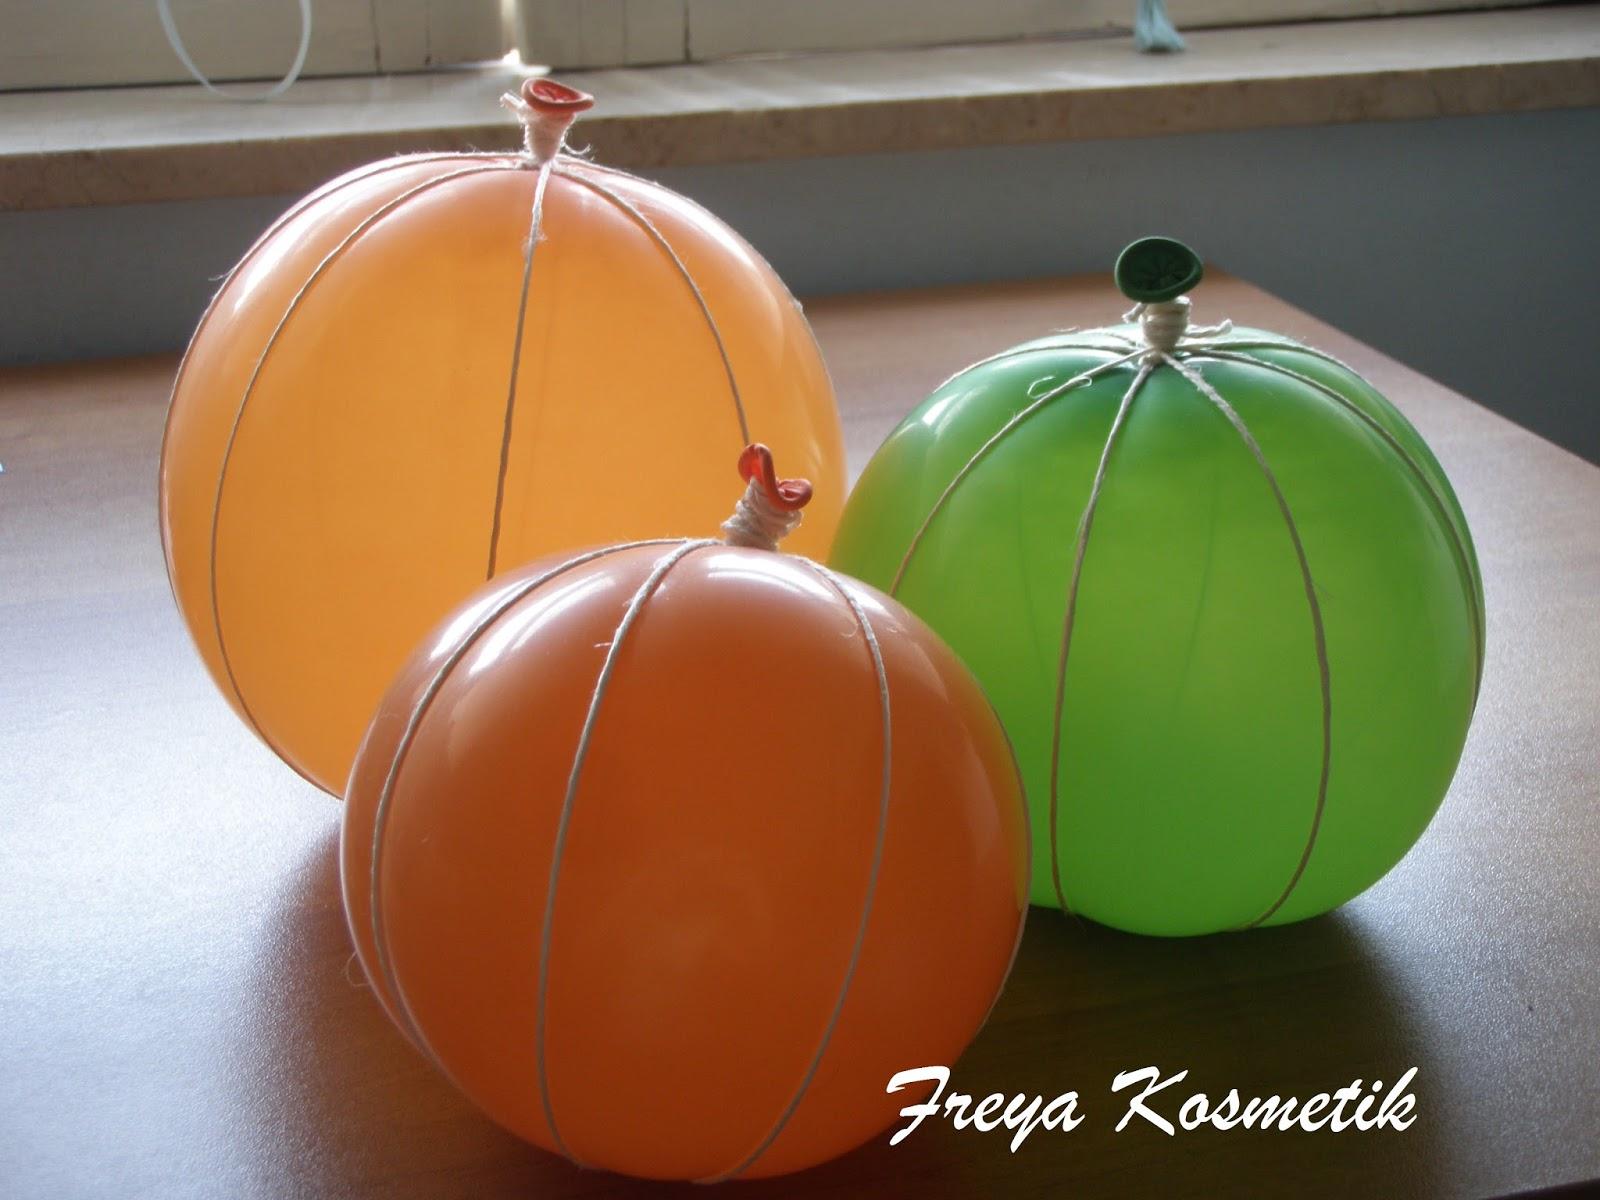 Zucca Halloween Cartapesta.Freya Kosmetik Zucchette Di Cartapesta